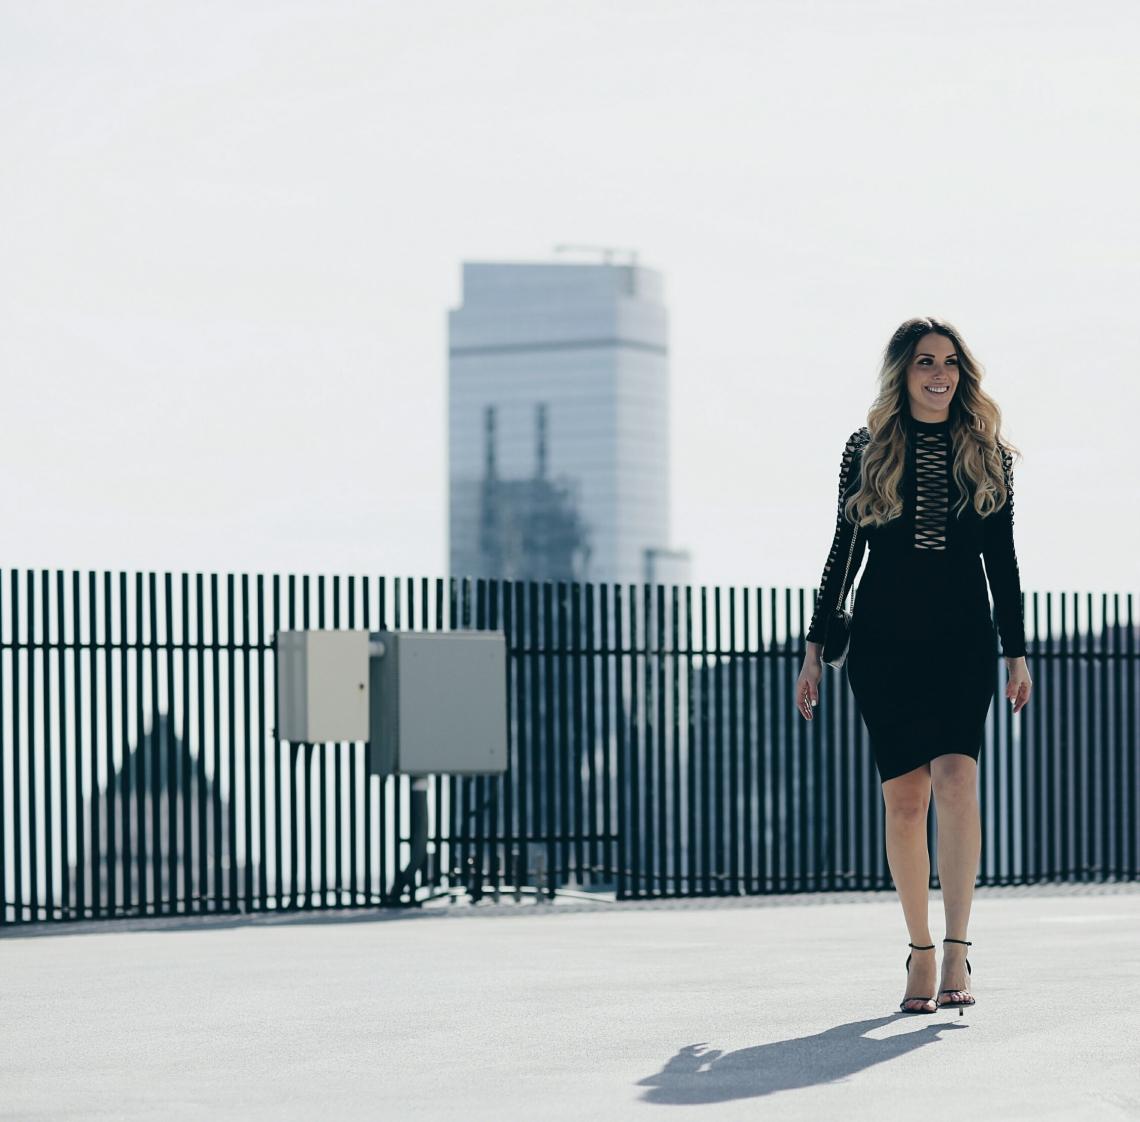 Missguided Lace Inset Long Sleeve Sheath Dress on Lauren Sebsatian of BigBlondeHair.com